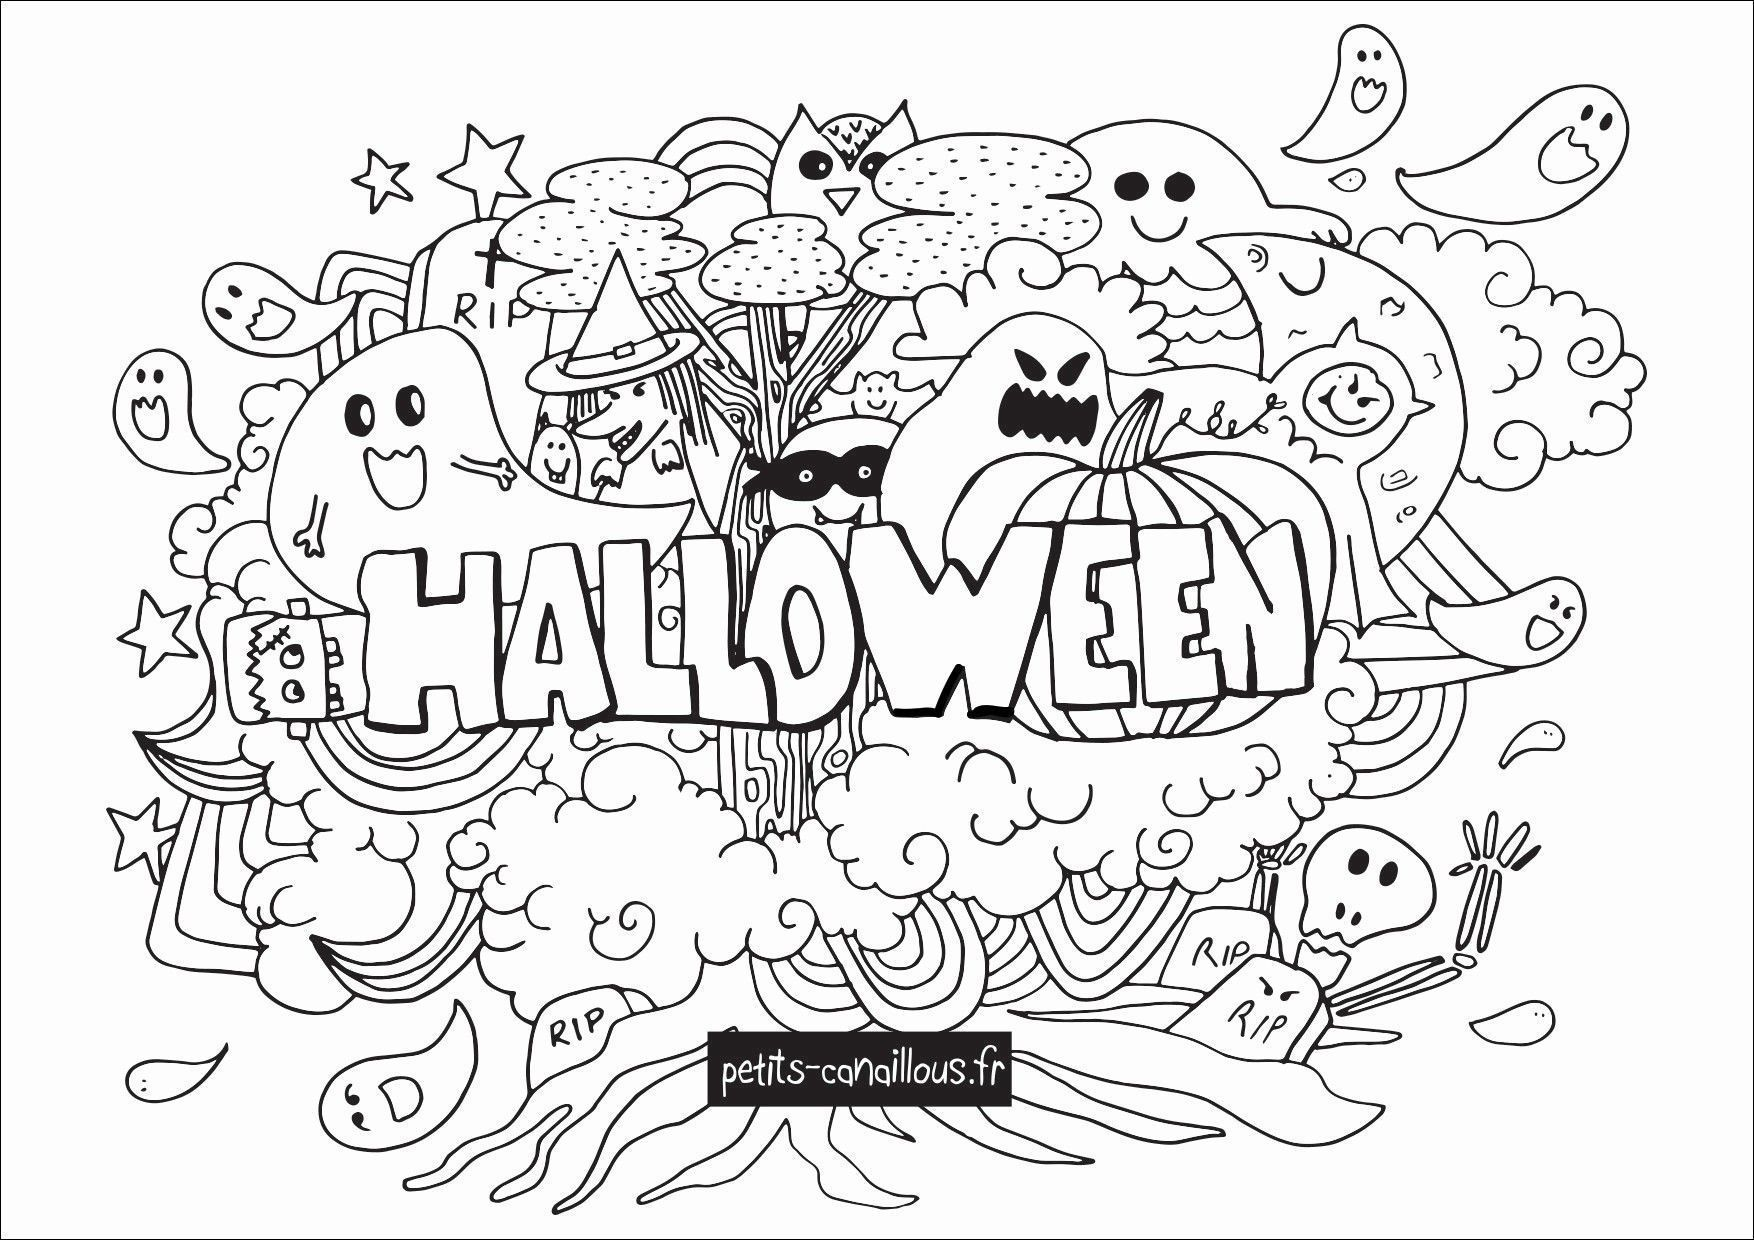 Pyjamasque Coloriage Coloriage Halloween A Imprimer Coloriage